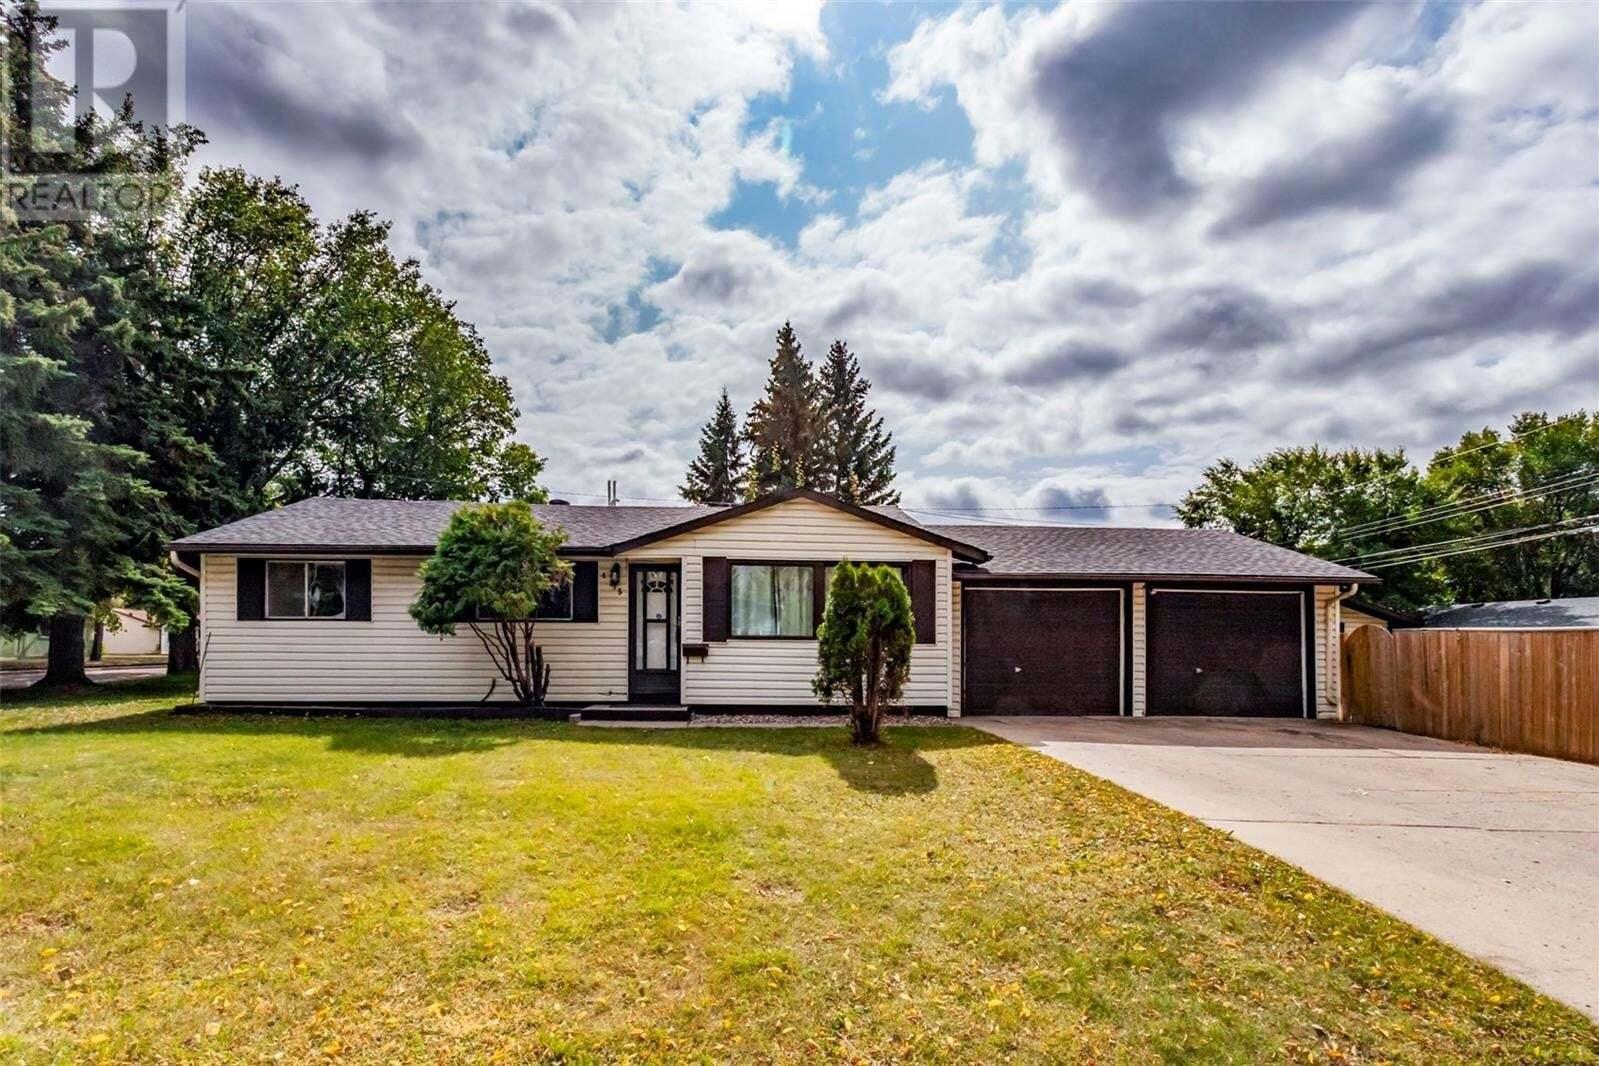 House for sale at 445 X Ave N Saskatoon Saskatchewan - MLS: SK826043